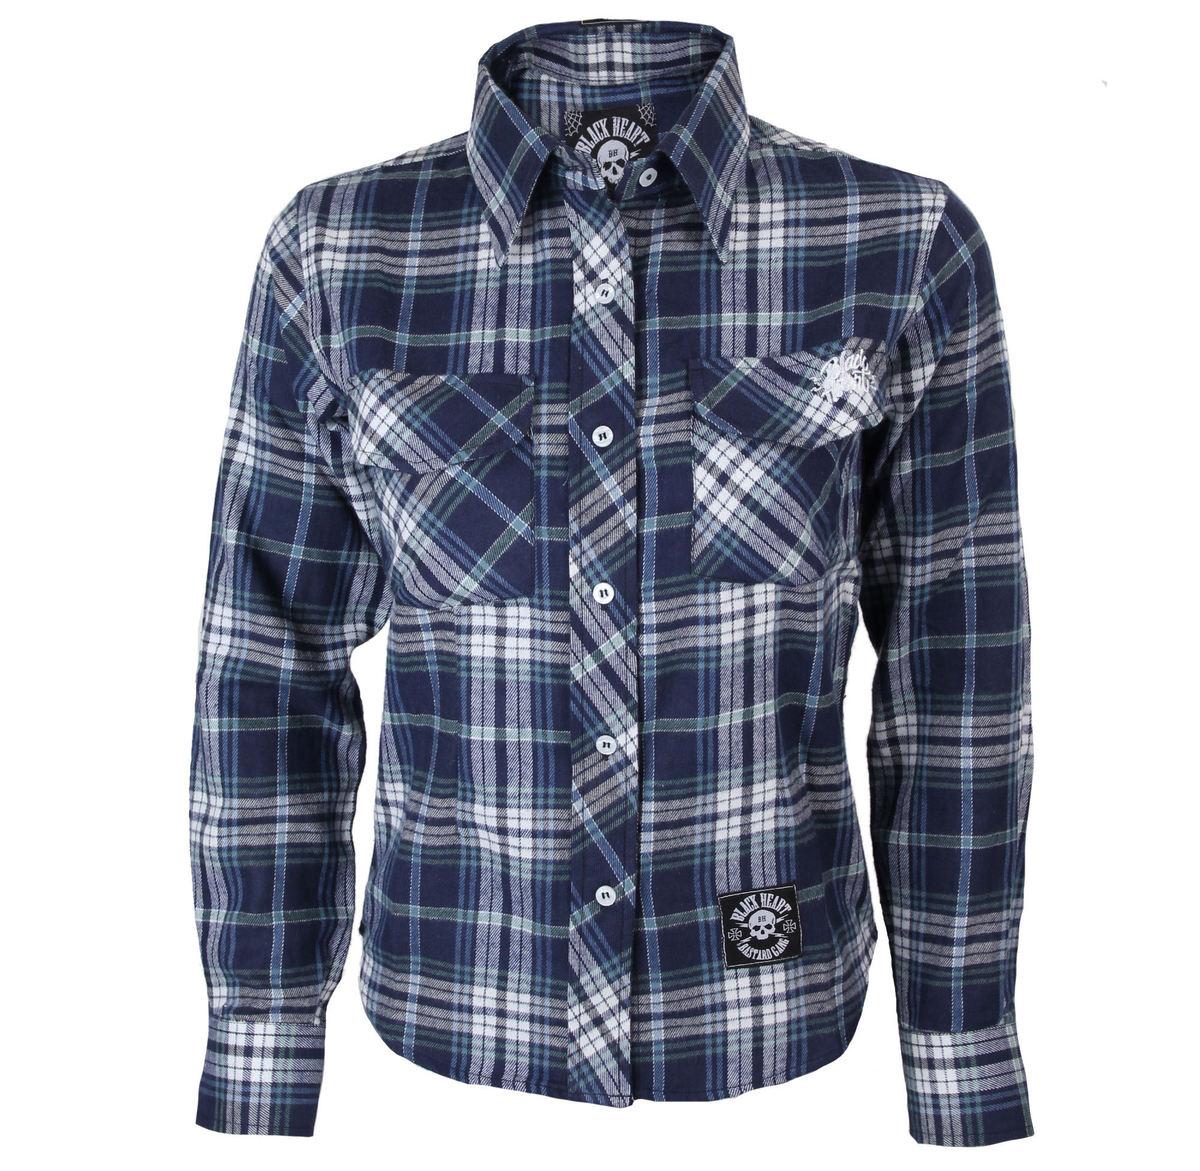 b78e3daa5f3 košile dámská BLACK HEART - Blue Bird - BLK - BH118 - metalshop.cz